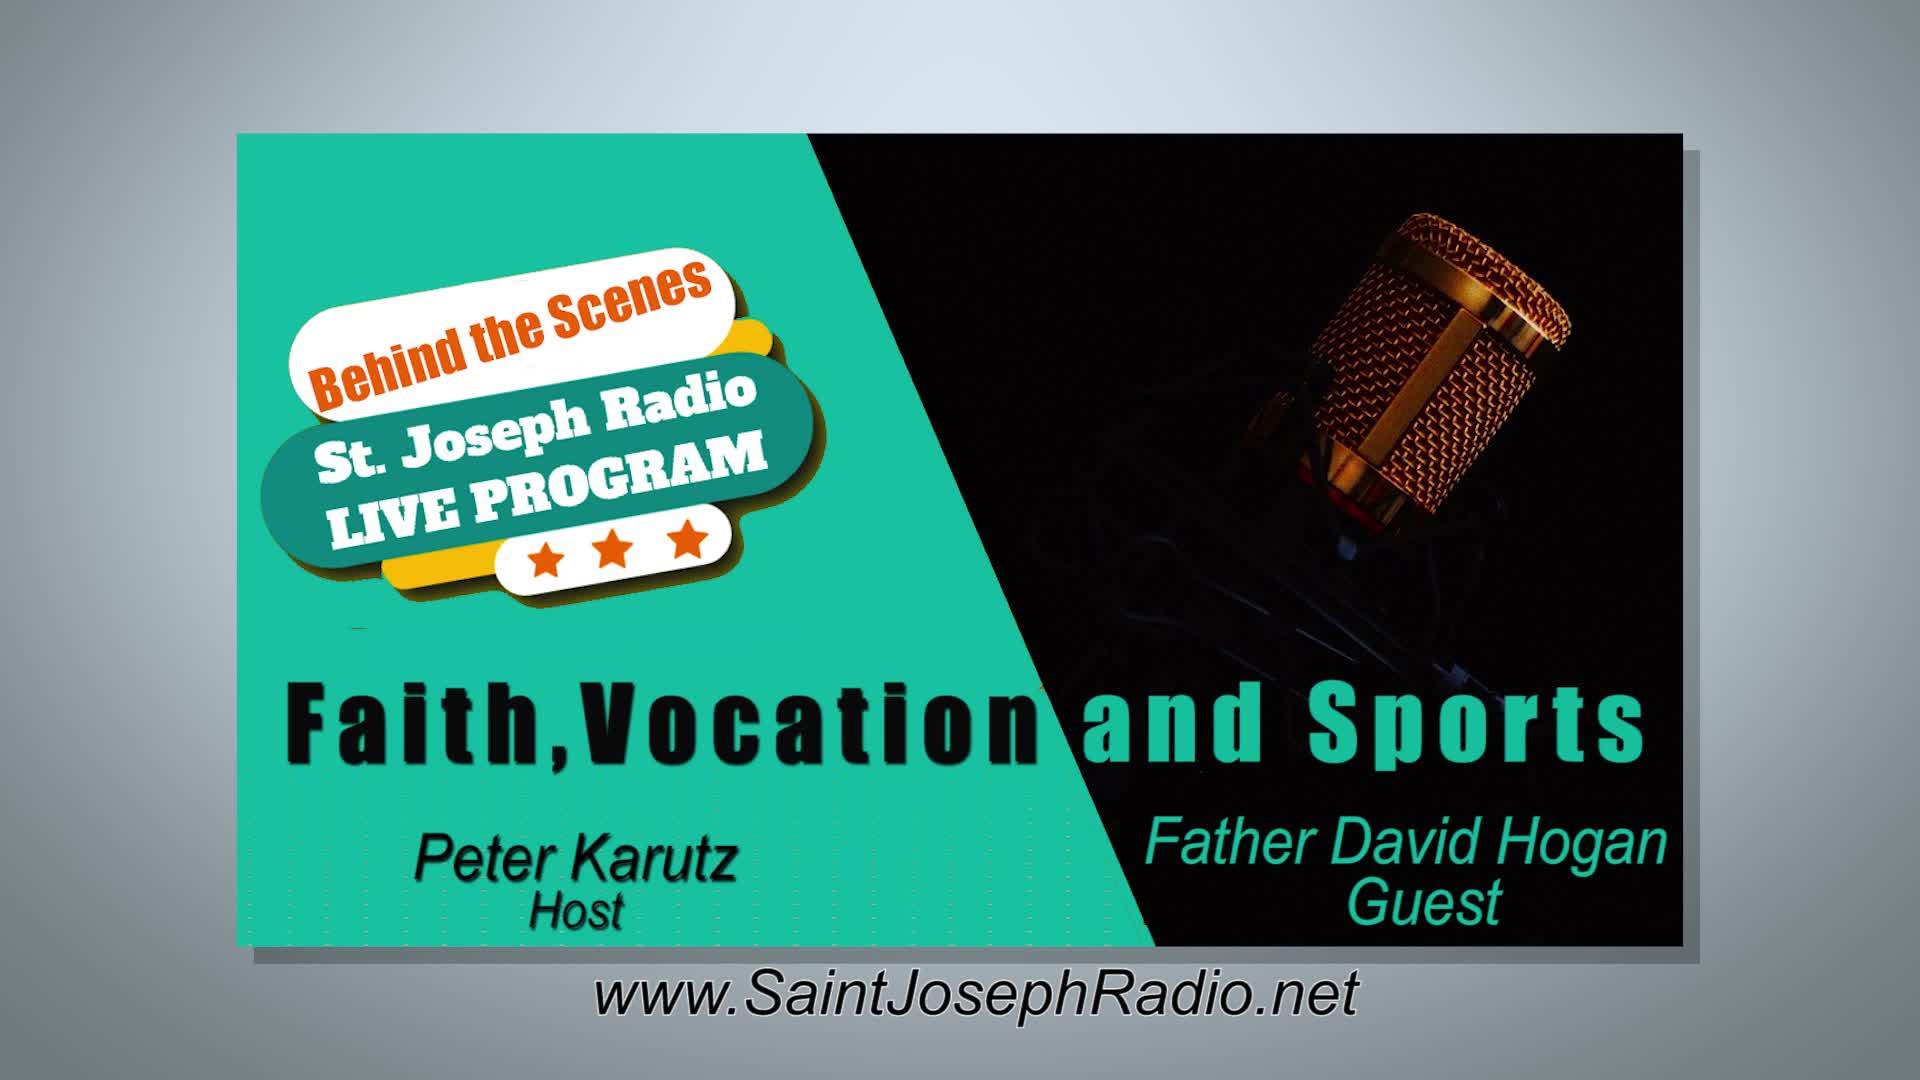 Faith, Vocation, and Sports